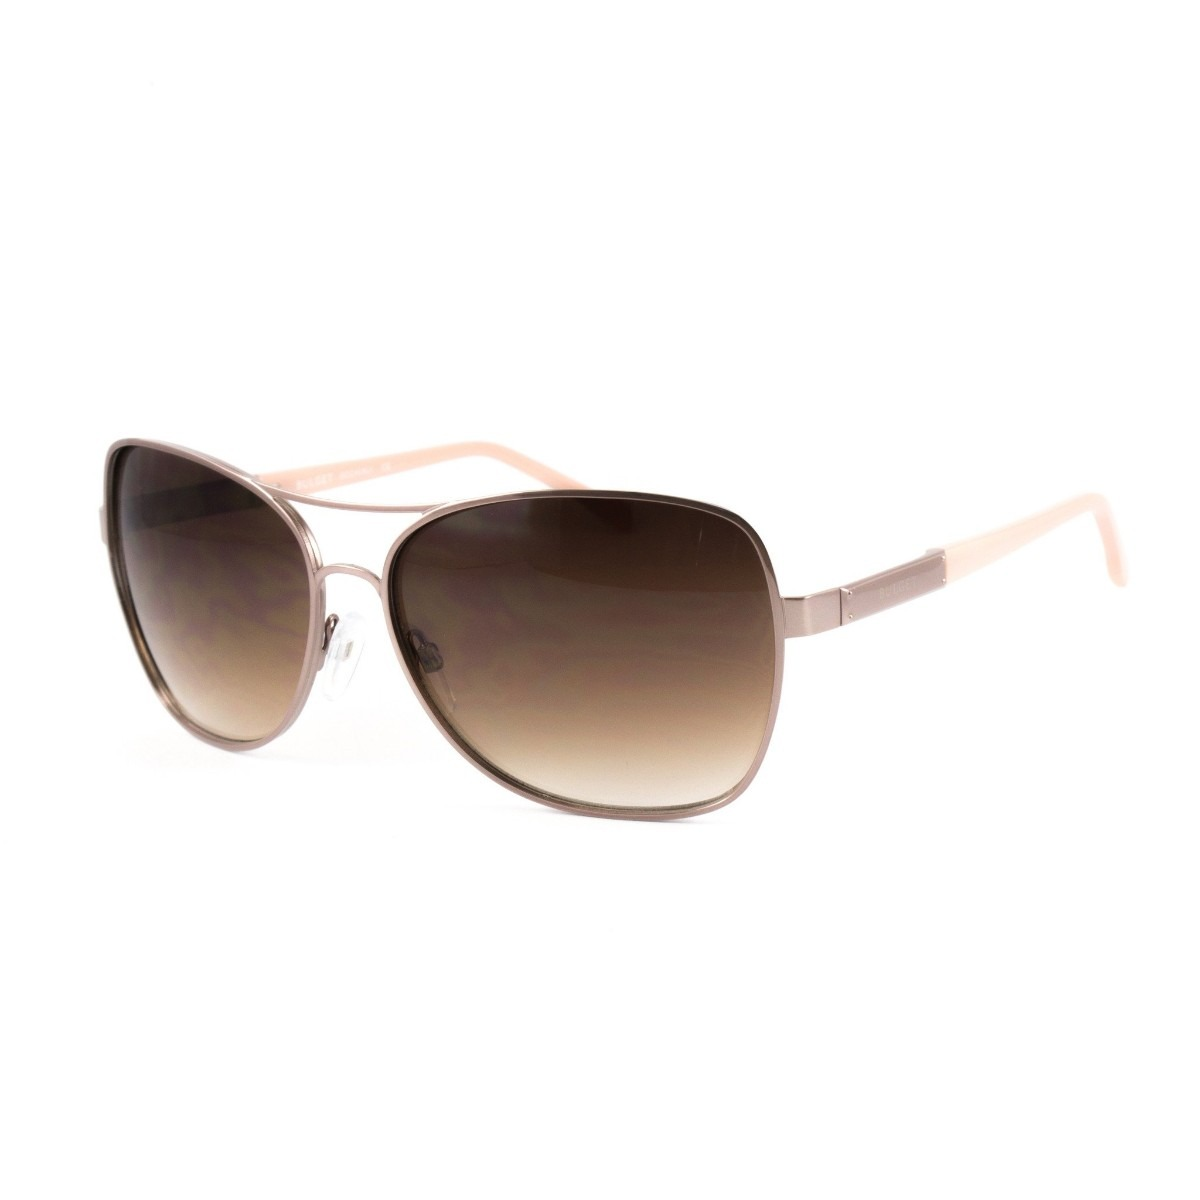 6de8f5c435764 óculos de sol bulget - bg 3158 01a. Carregando zoom.